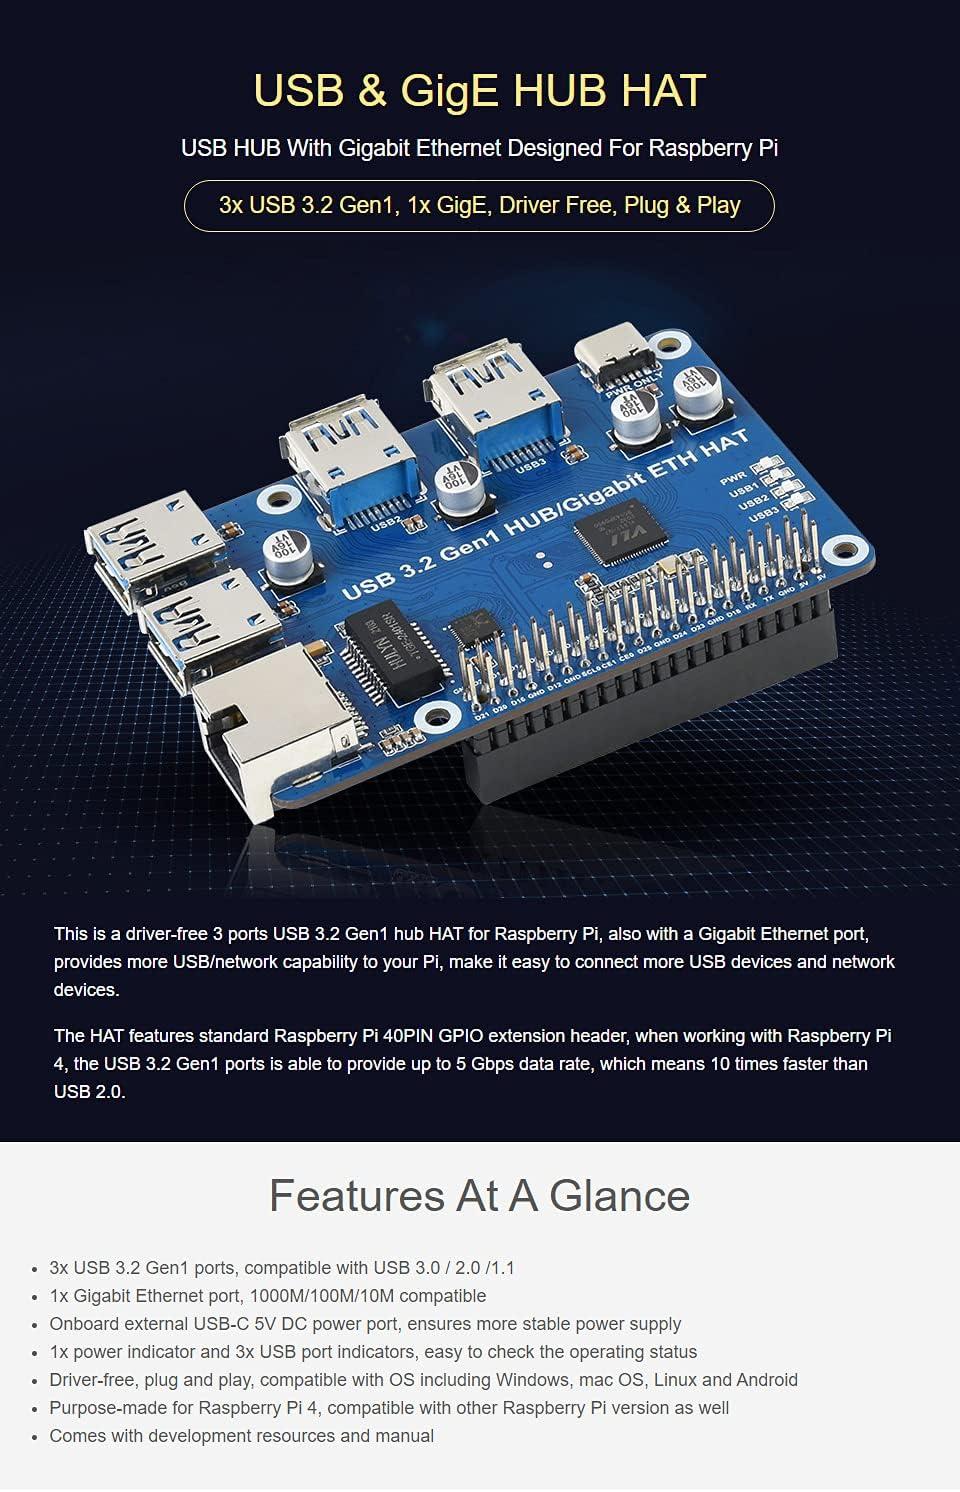 Waveshare USB 3.2 Gen1 and Gigabit Ethernet HUB HAT for Raspberry Pi 3X USB 3.2 Gen1 1x Gigabit Ethernet Driver-Free Plug & Play